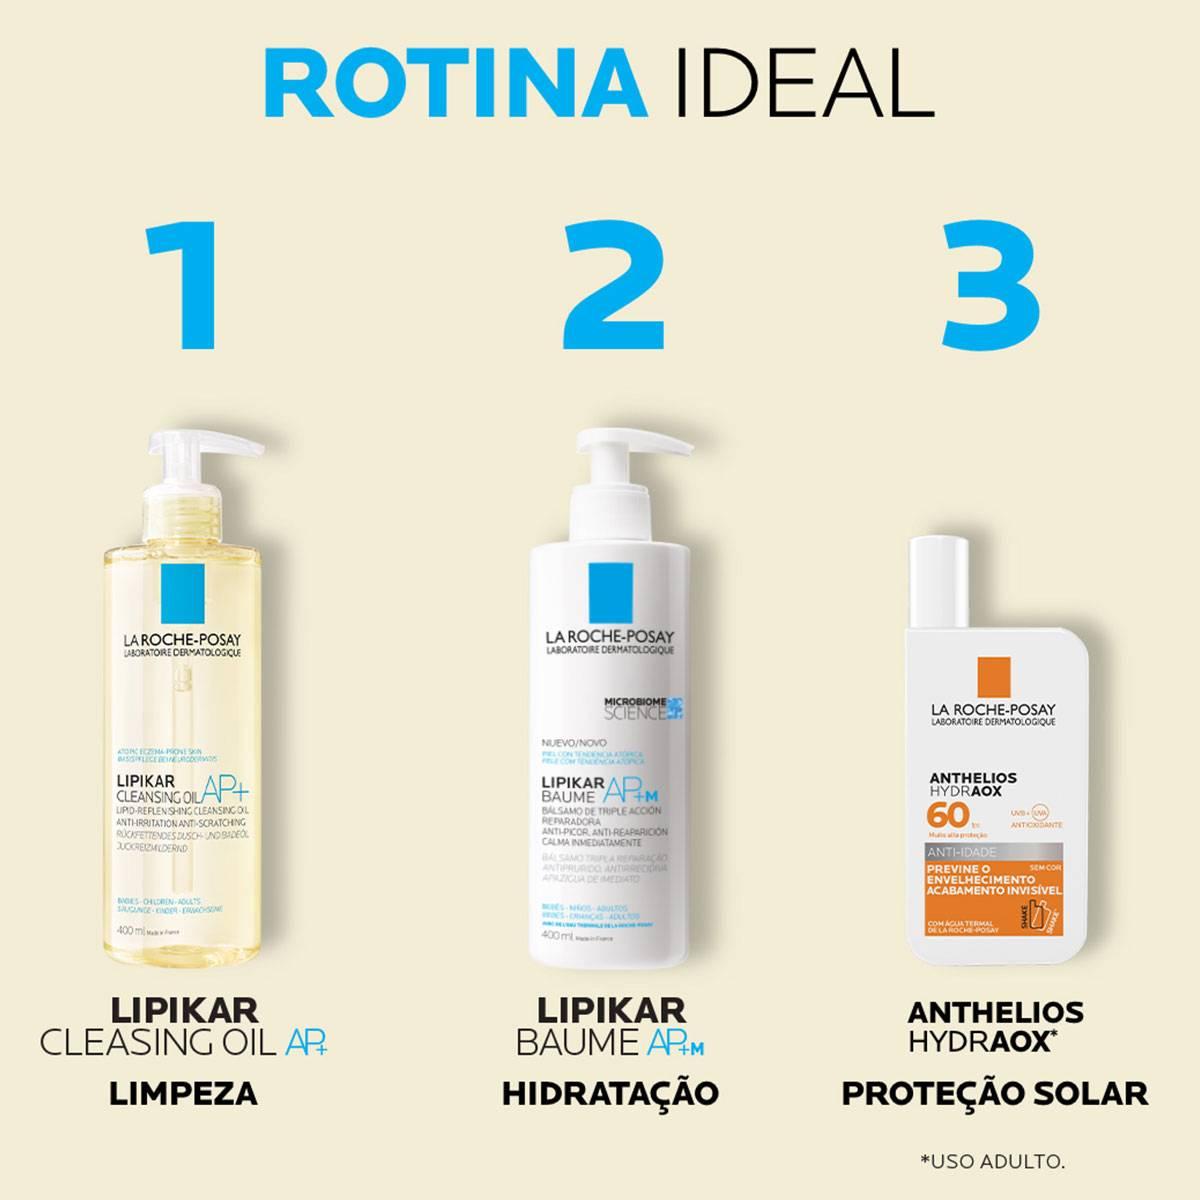 Rotina completa com o novo Lipikar Cleasing Oil AP+ 400ml | La Roche-Posay